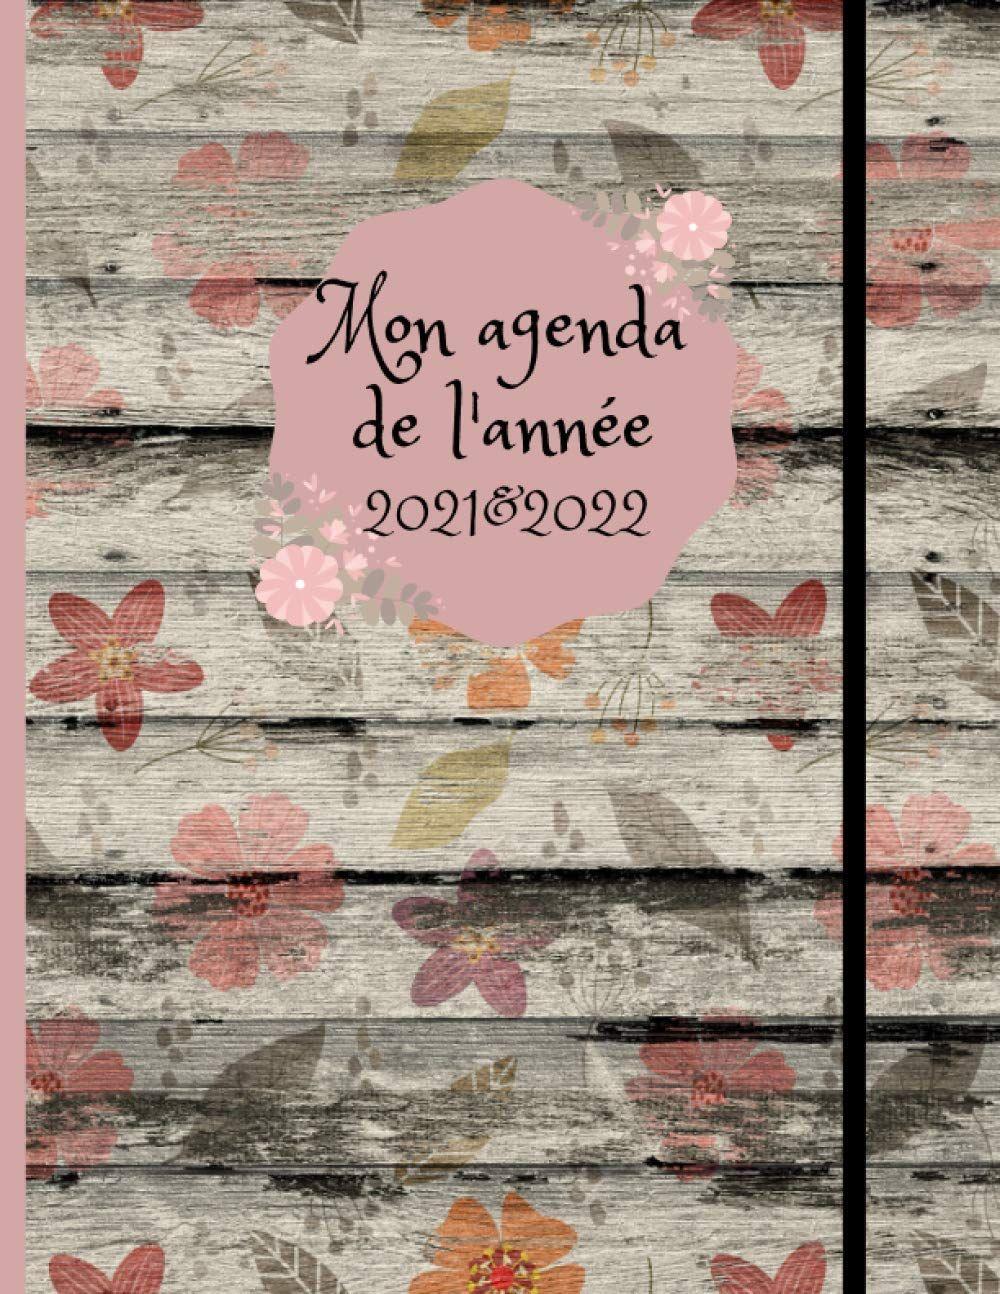 Mon Agenda De L Annee 2021 2022 Photoshop Movie Posters Poster